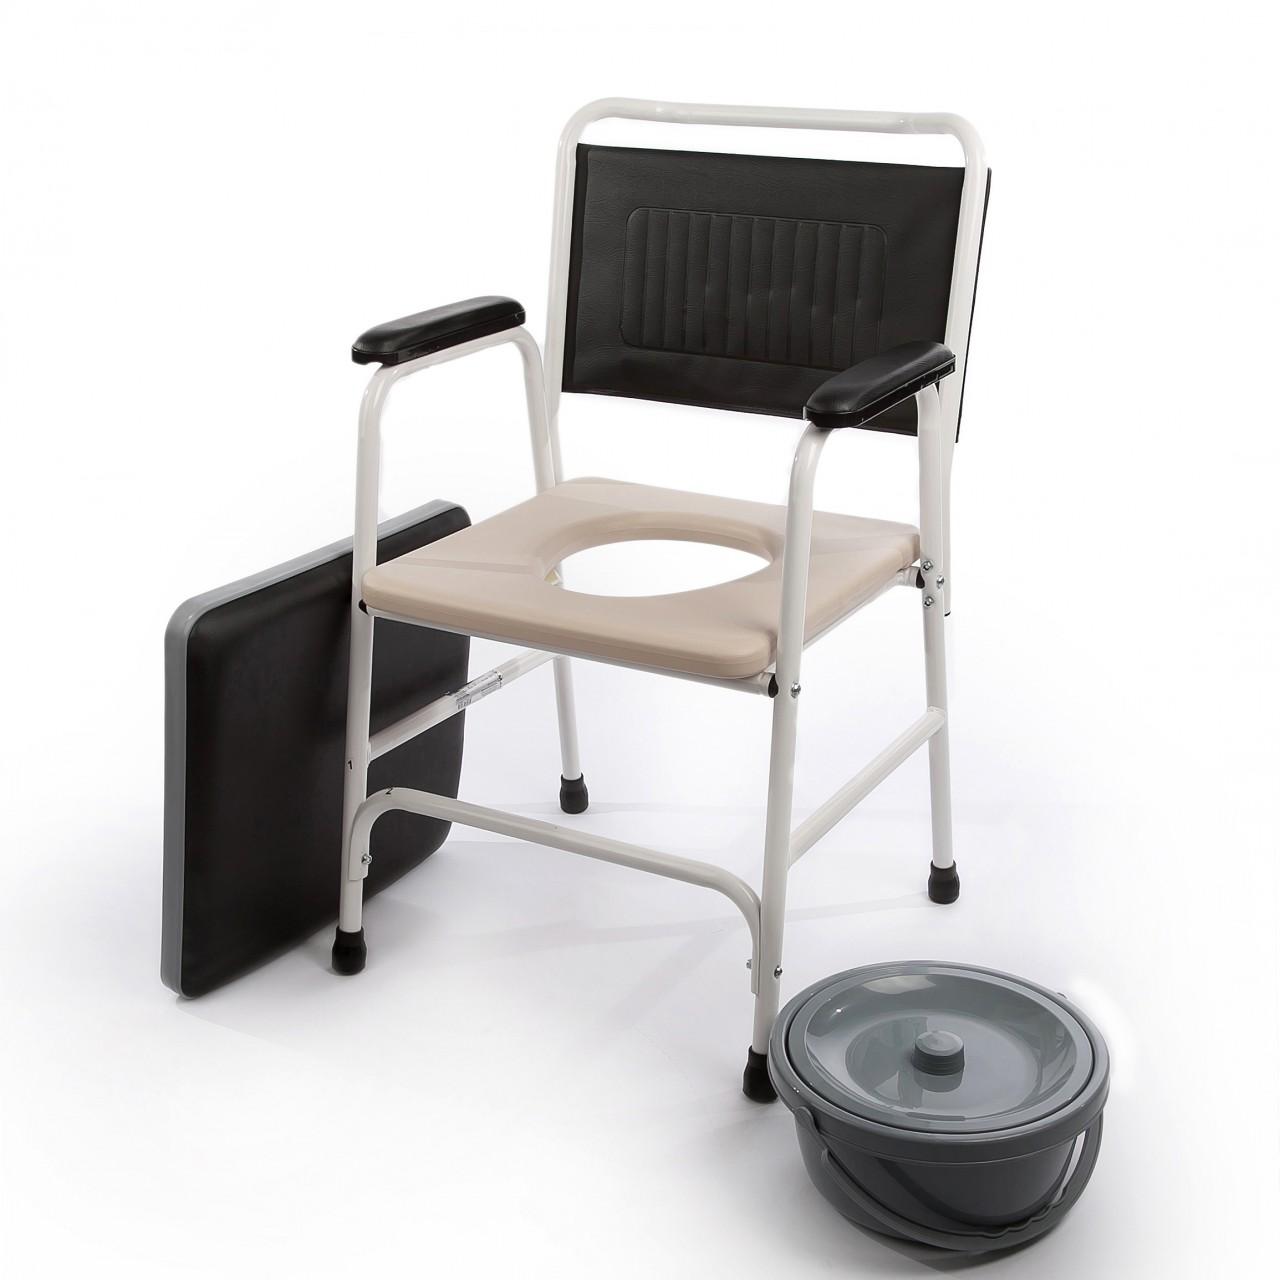 Scaun toaleta de camera cu sezut moale Ortomobil 027020